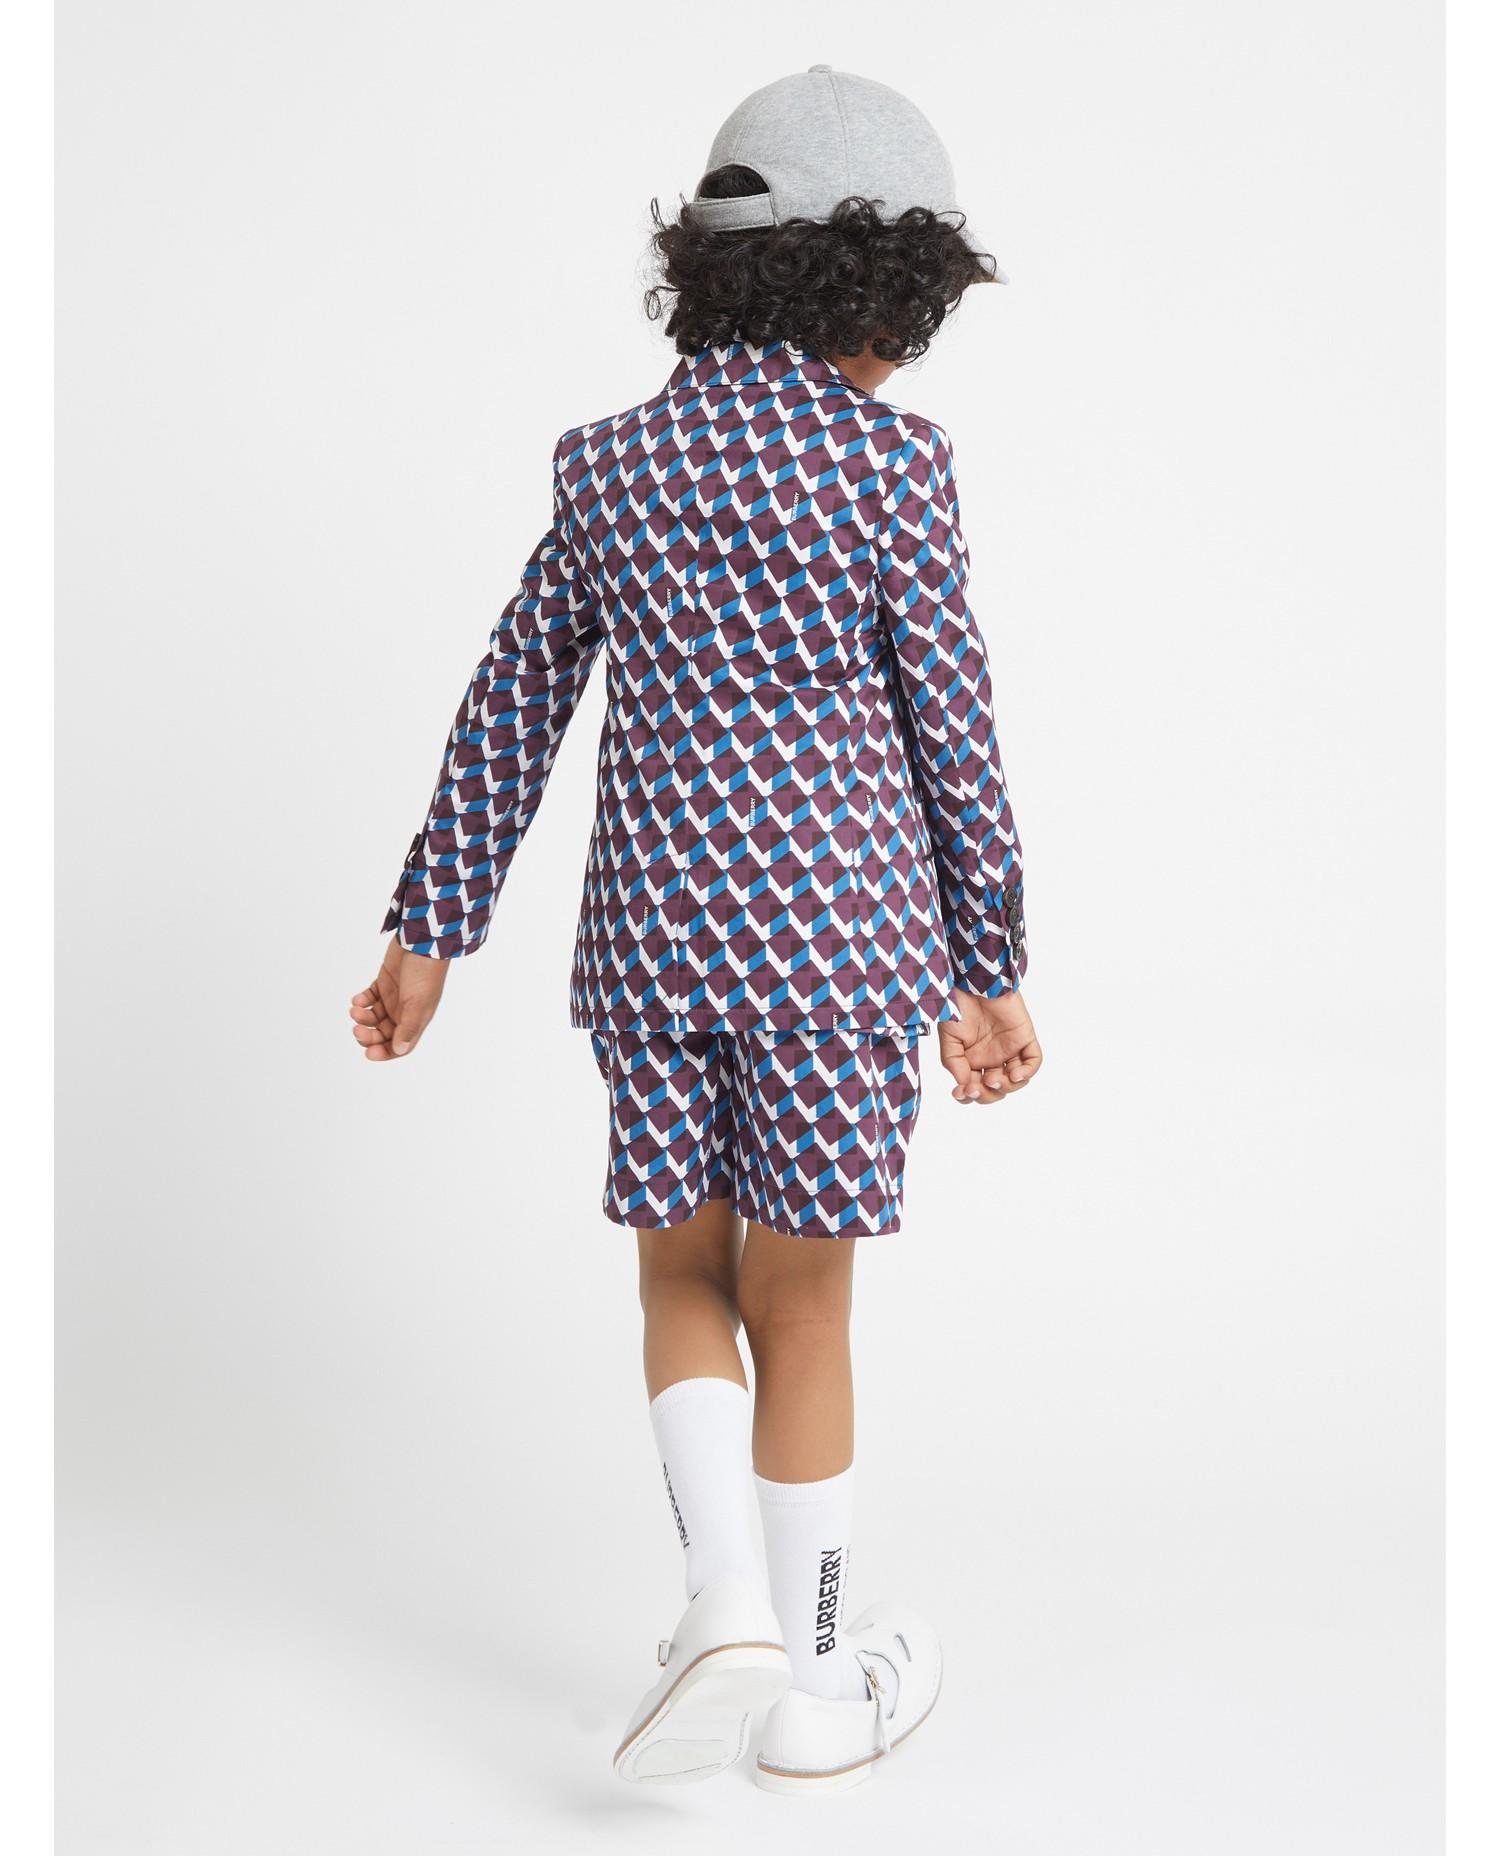 b97d9c9211e9 Shop Childrenswear